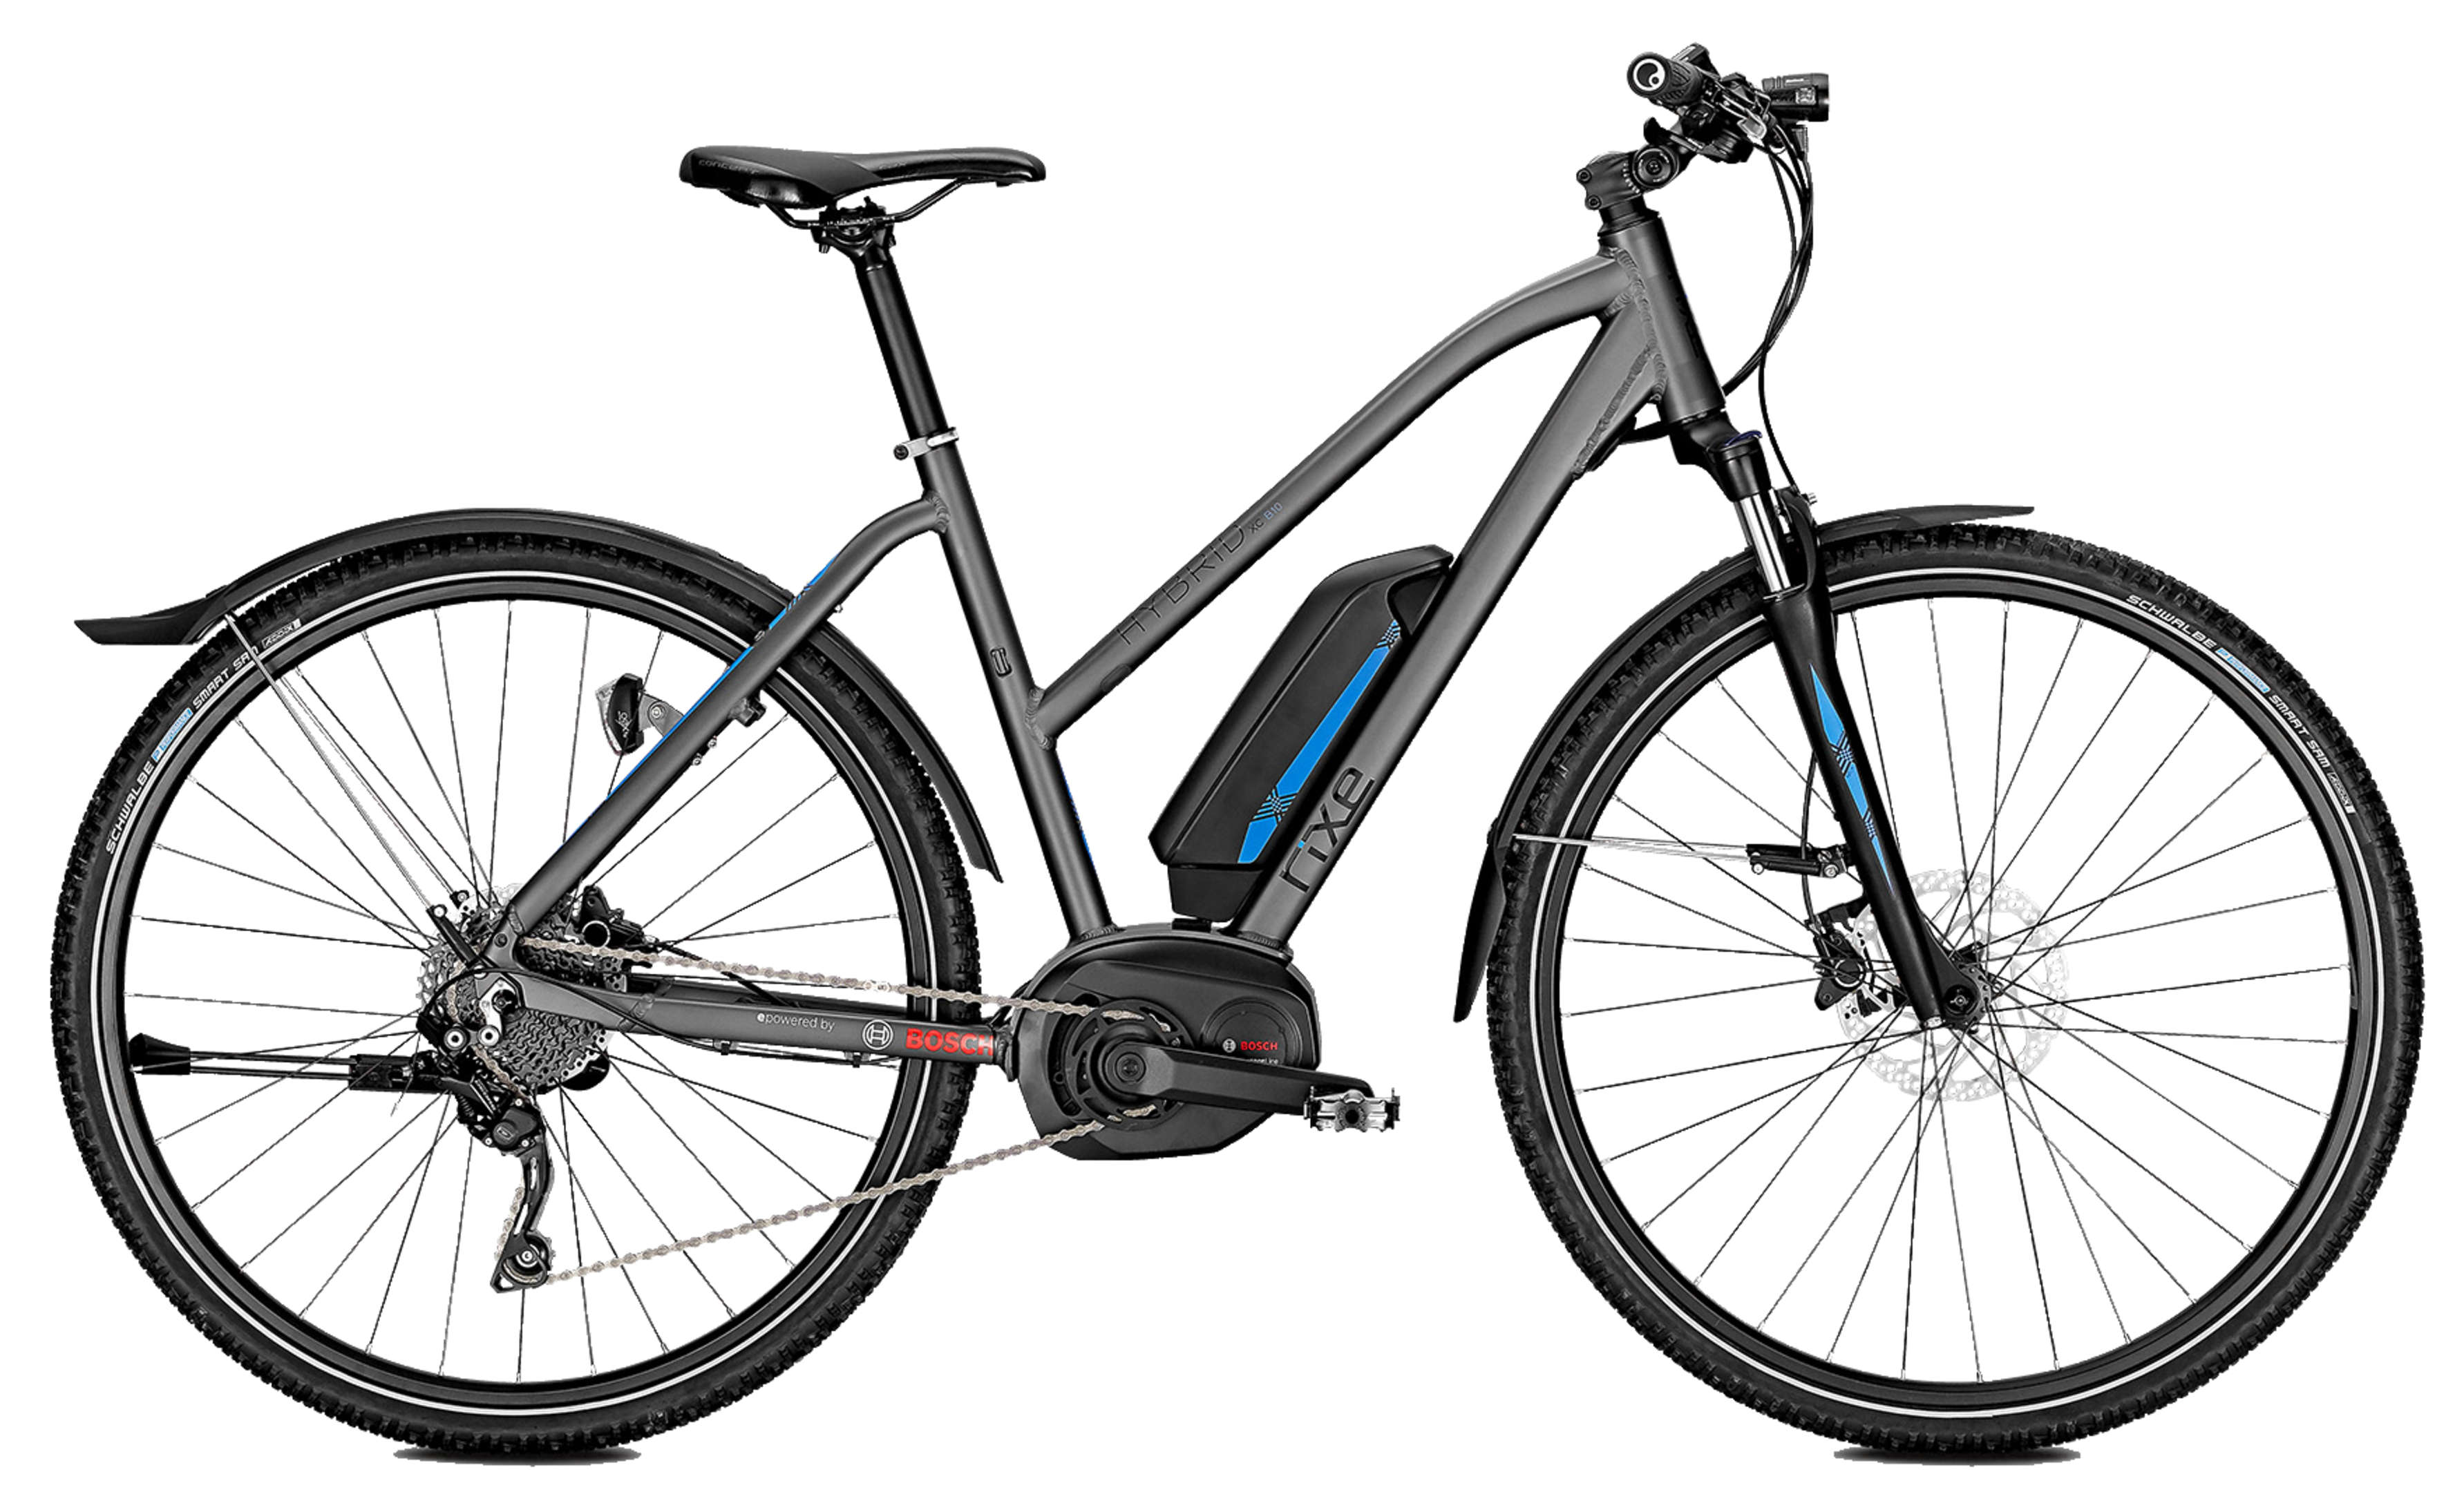 rixe e bike hybrid xc b10 10g 13 4ah 36v 2 eurorad bikeleasingeurorad bikeleasing. Black Bedroom Furniture Sets. Home Design Ideas